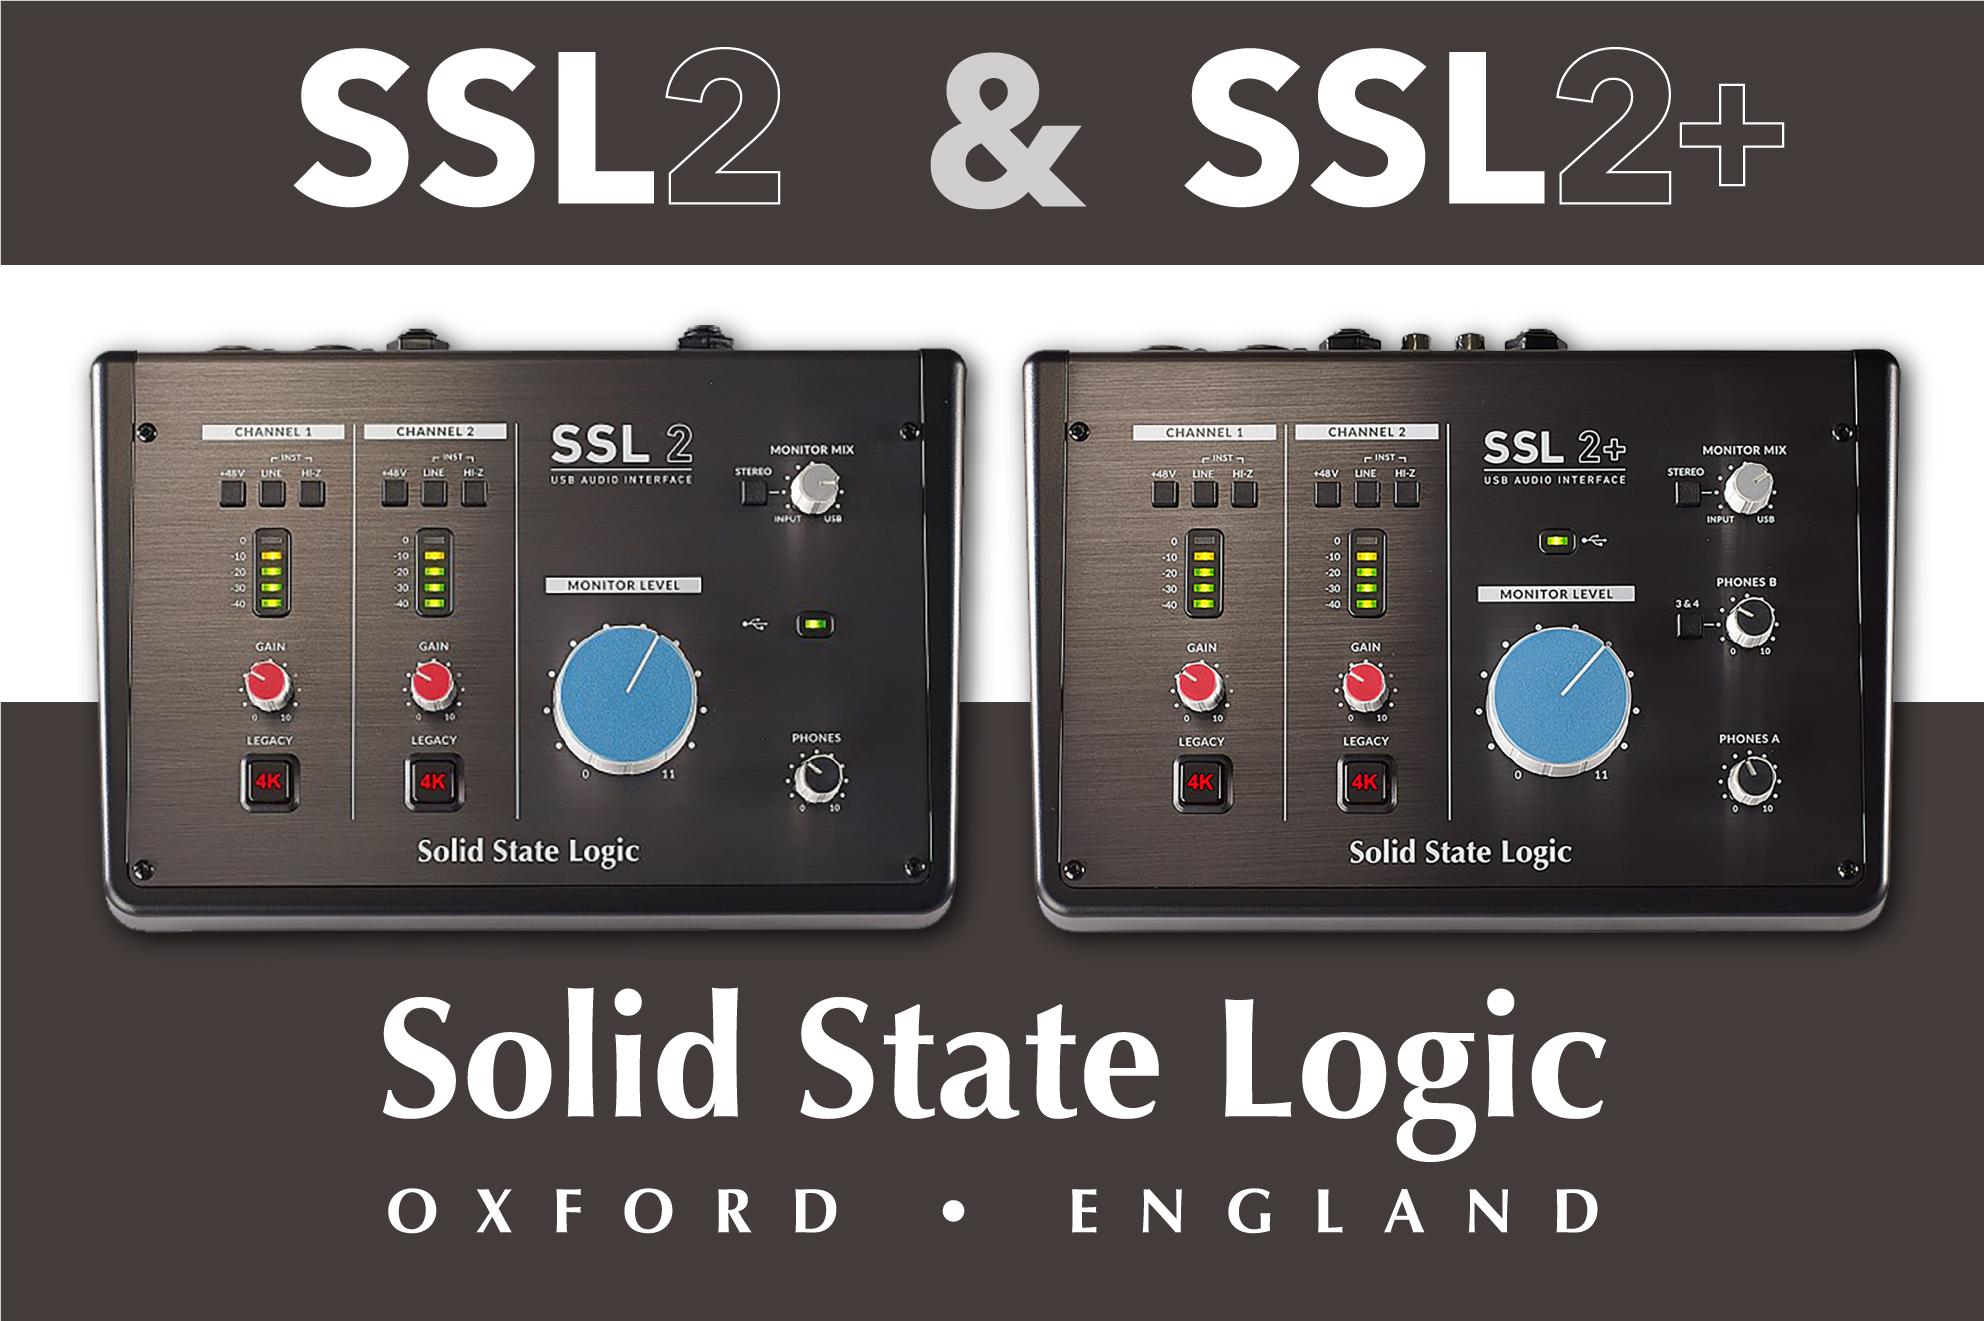 SSL-New-audio-interface